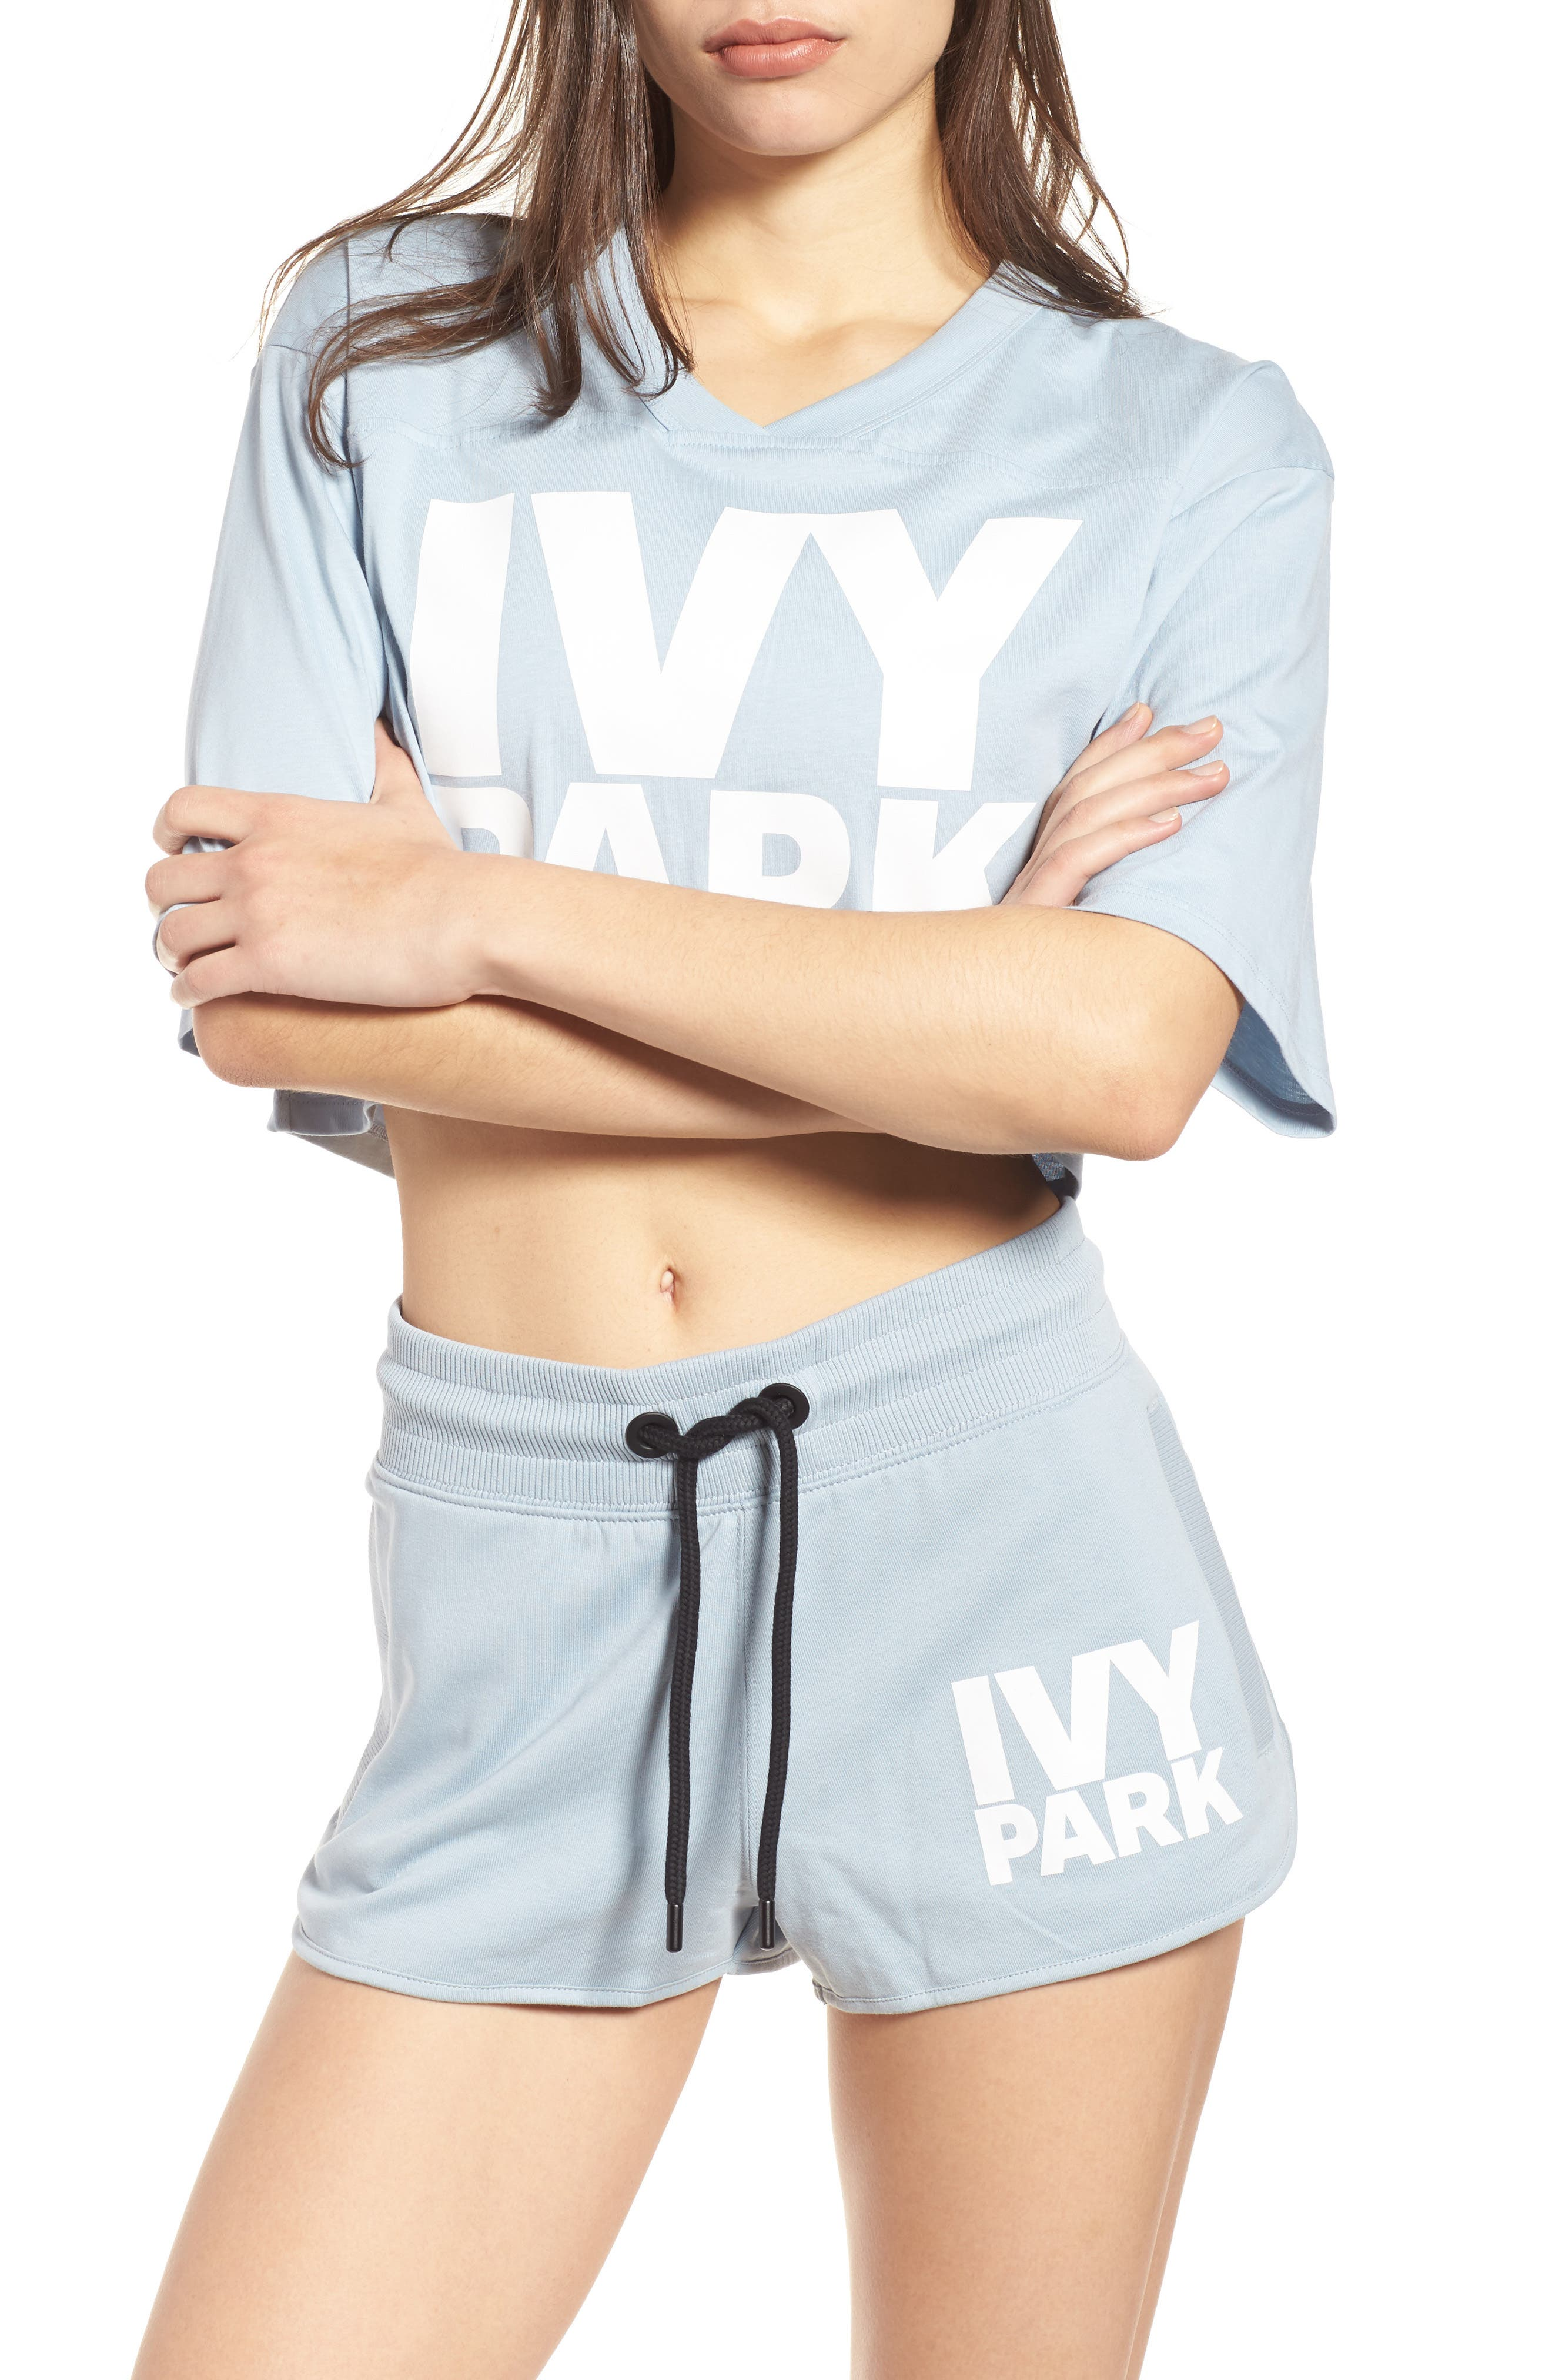 IVY PARK® Logo Crop Tee